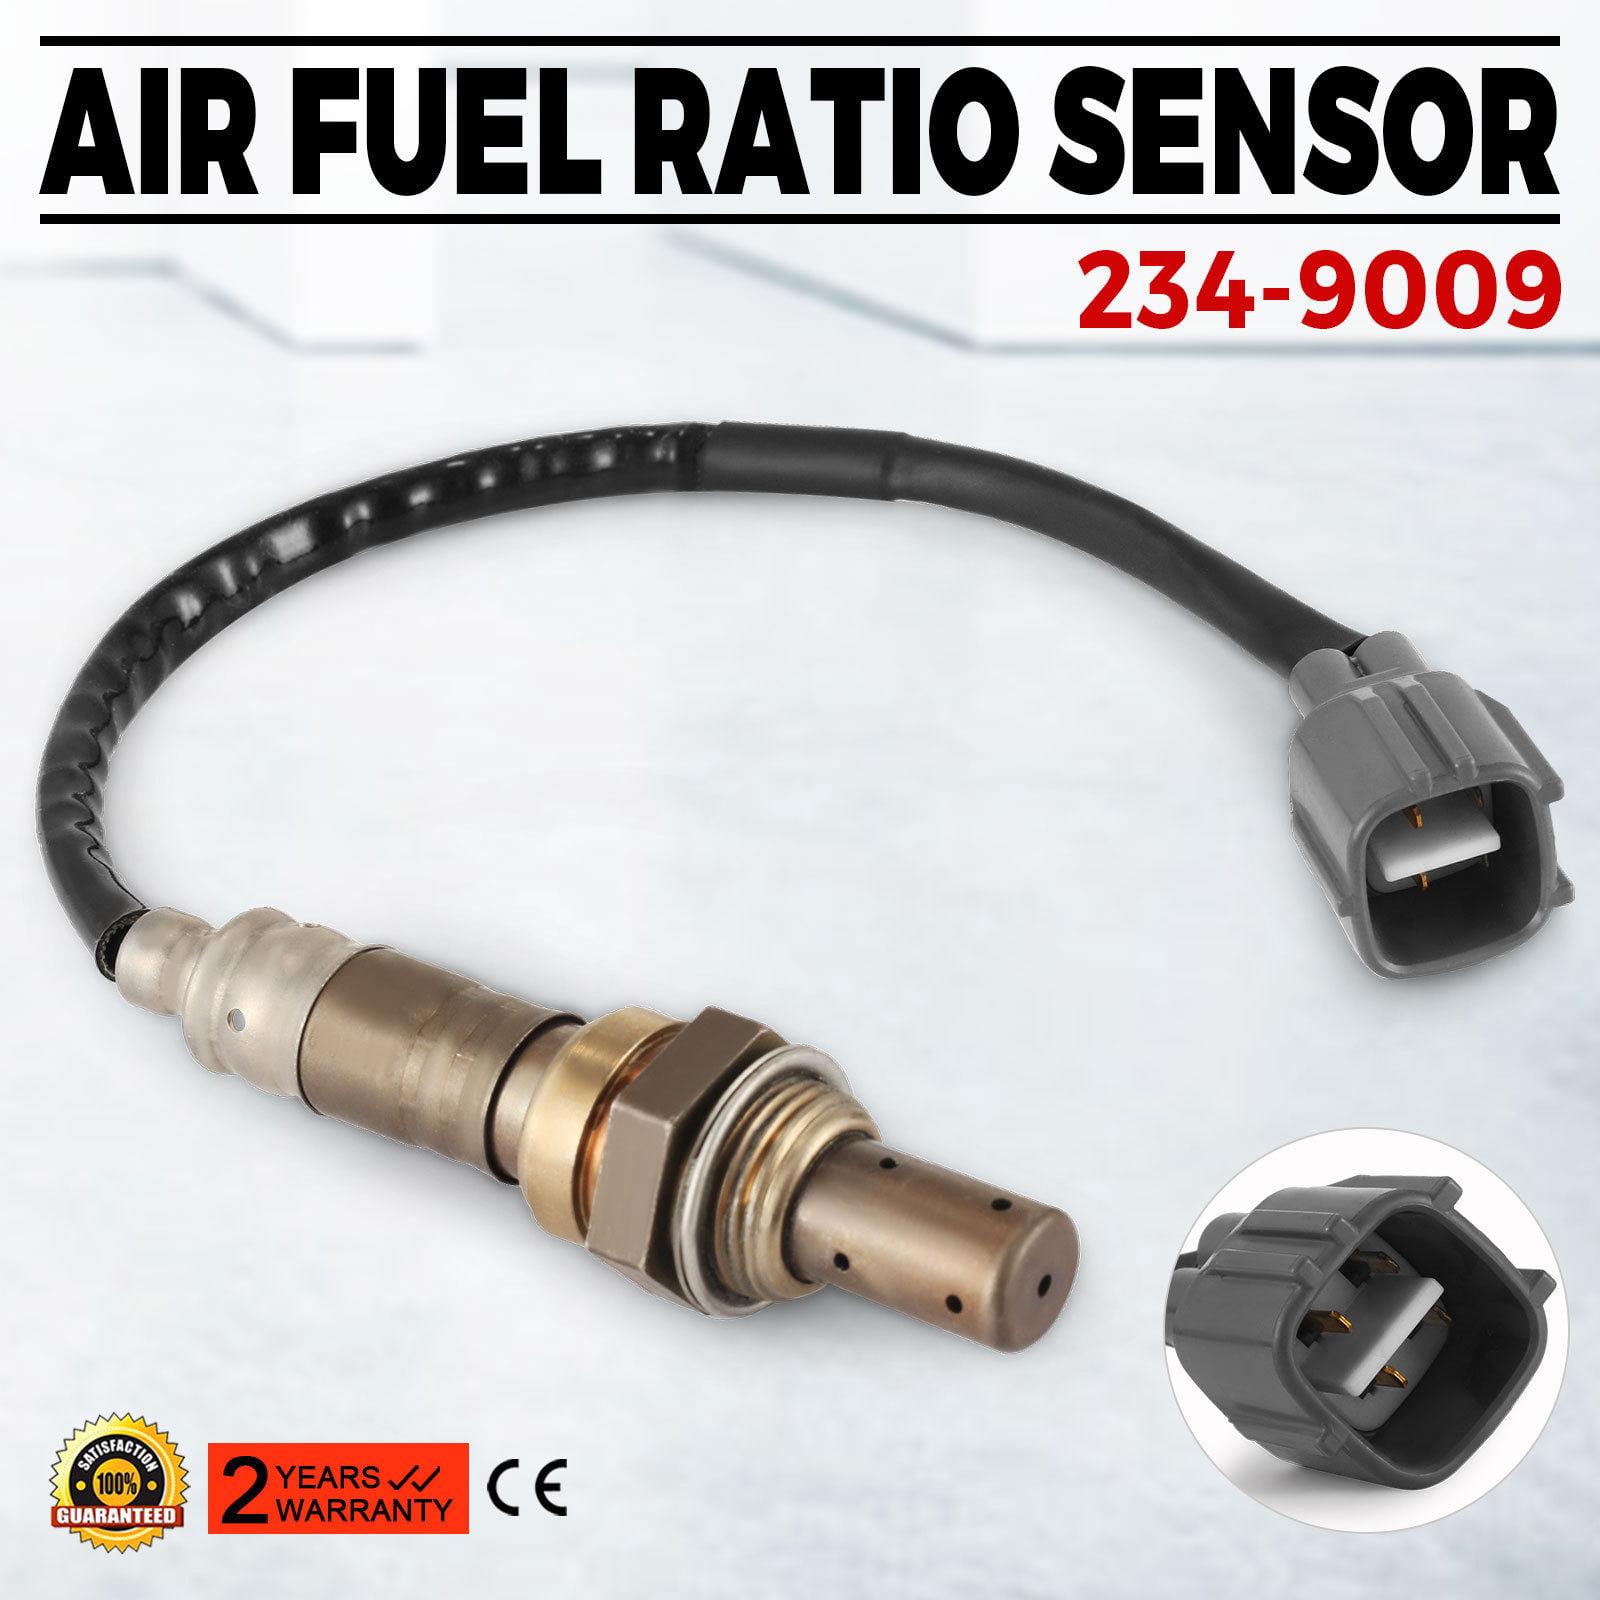 234-9009 Denso O2 OXYGEN Air Fuel Ratio Sensor 89467-48011 fit Toyota Lexus US